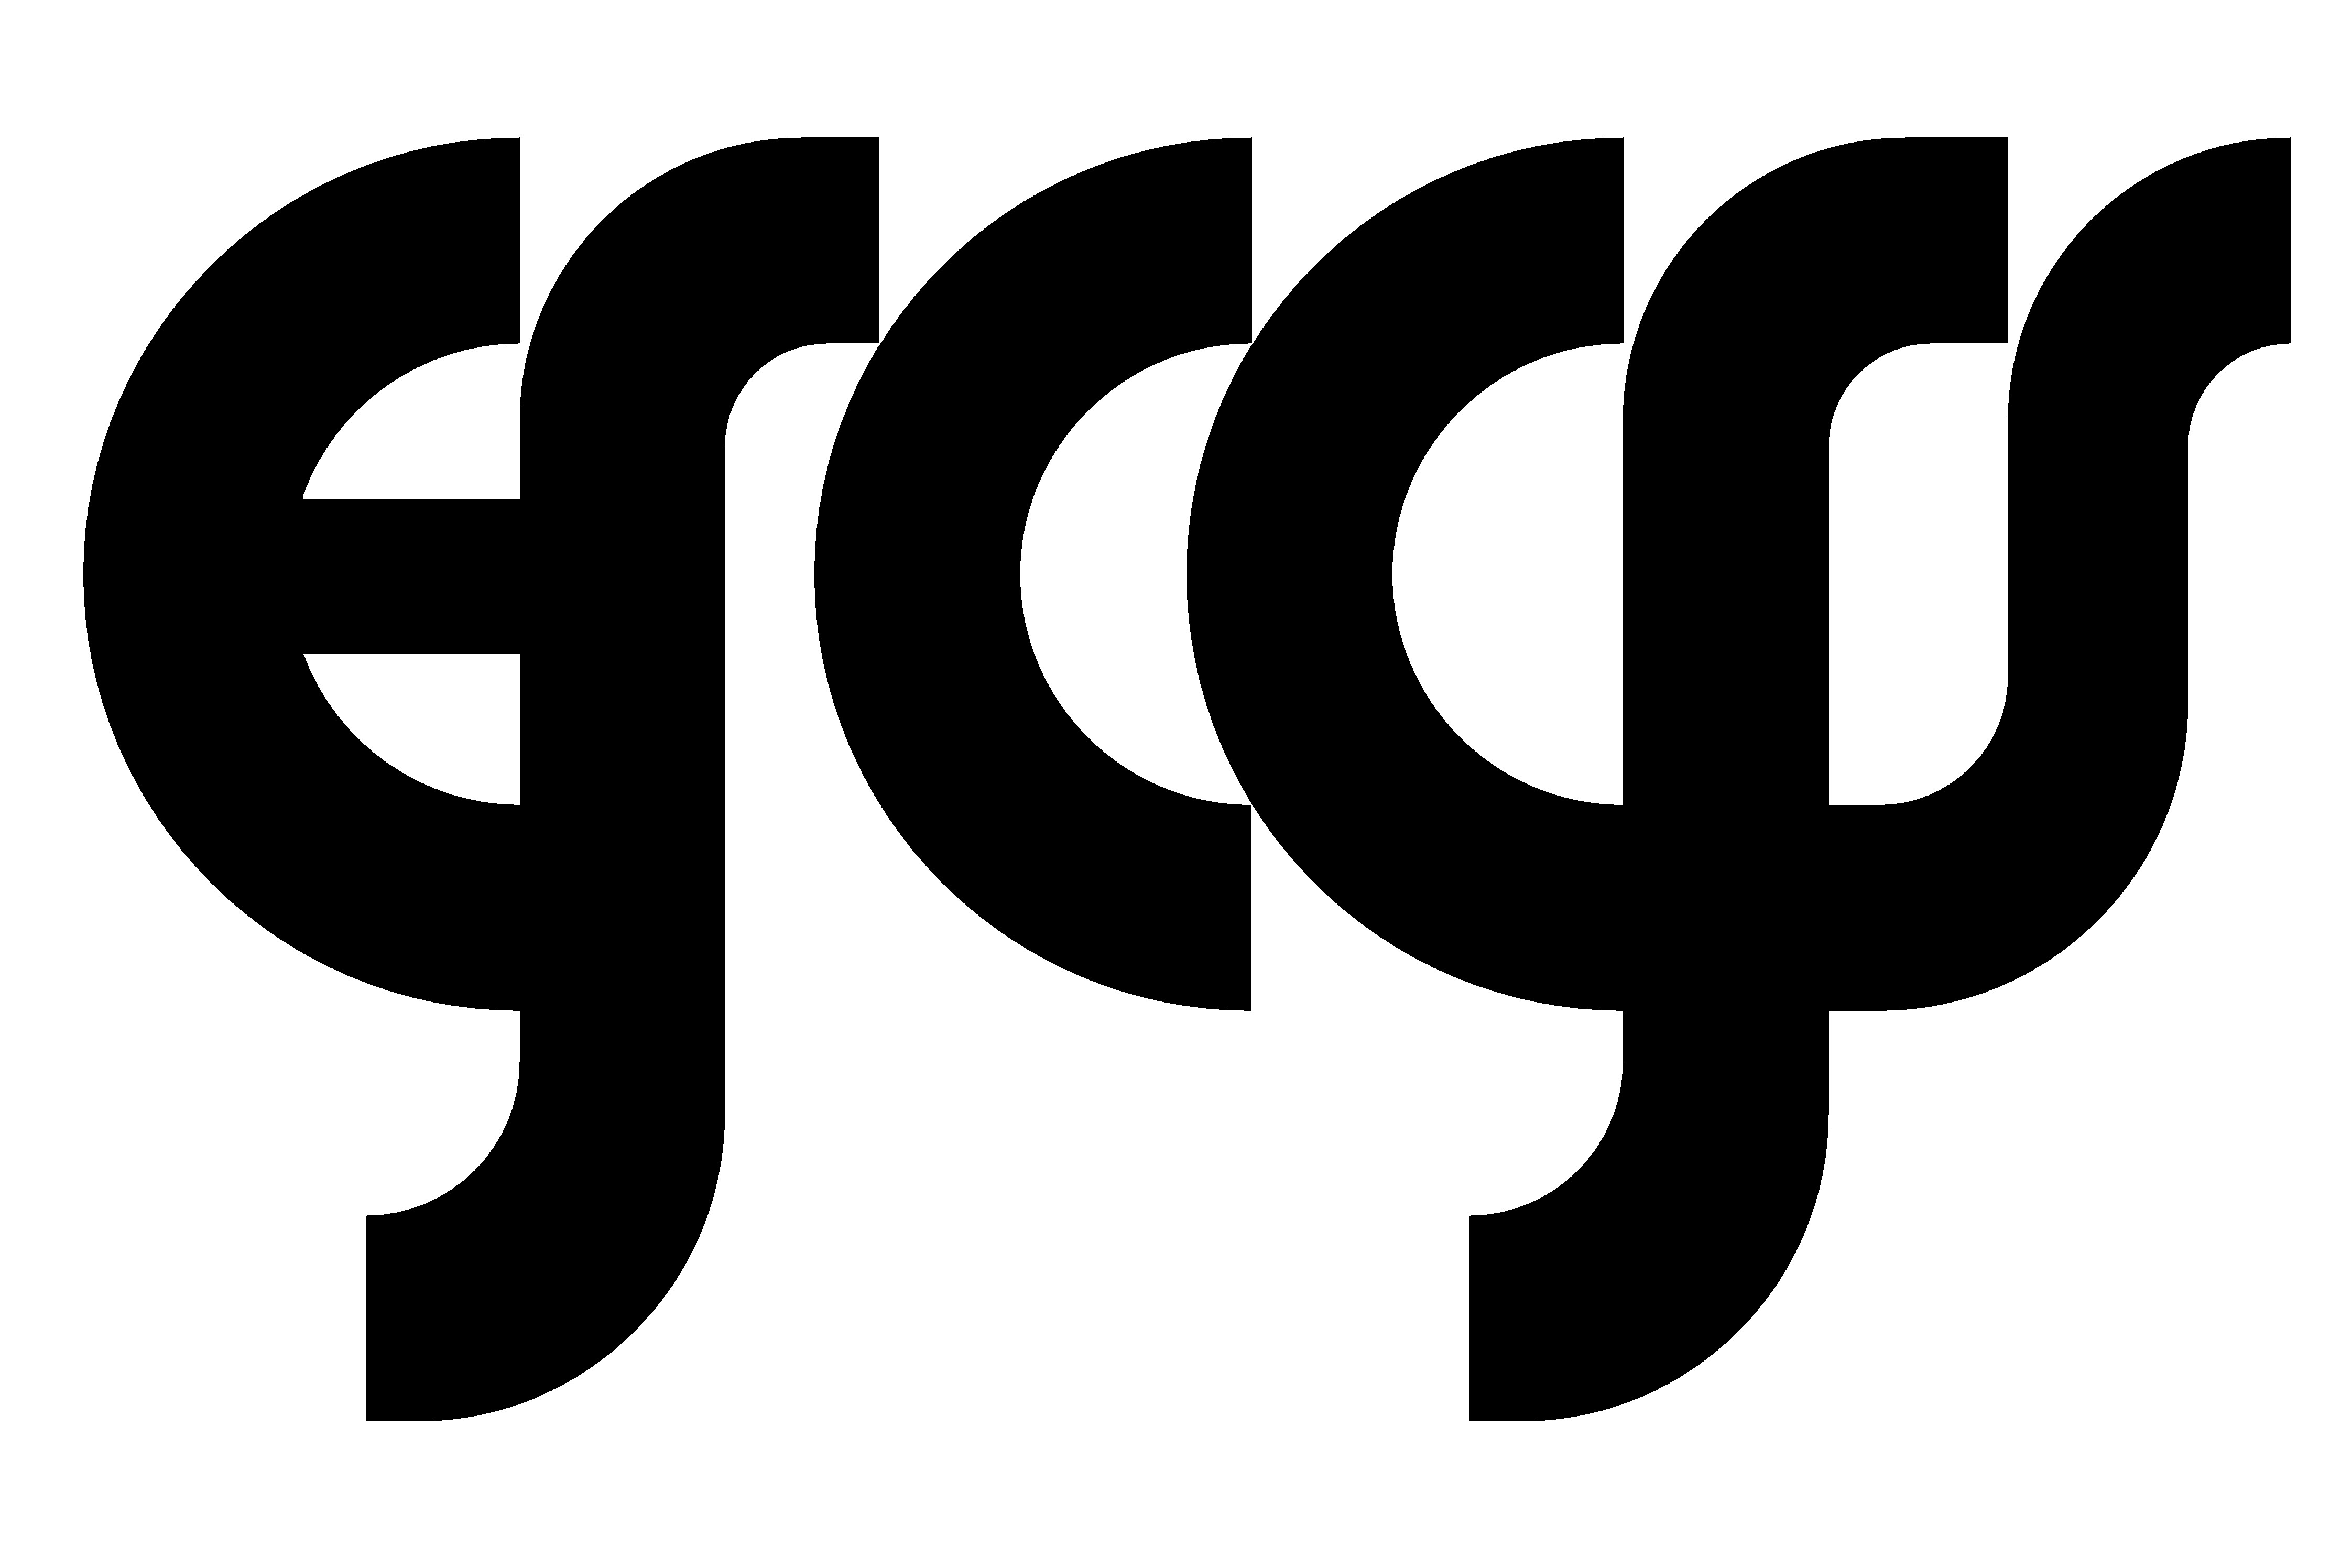 logo for European Society for Cognitive Psychology